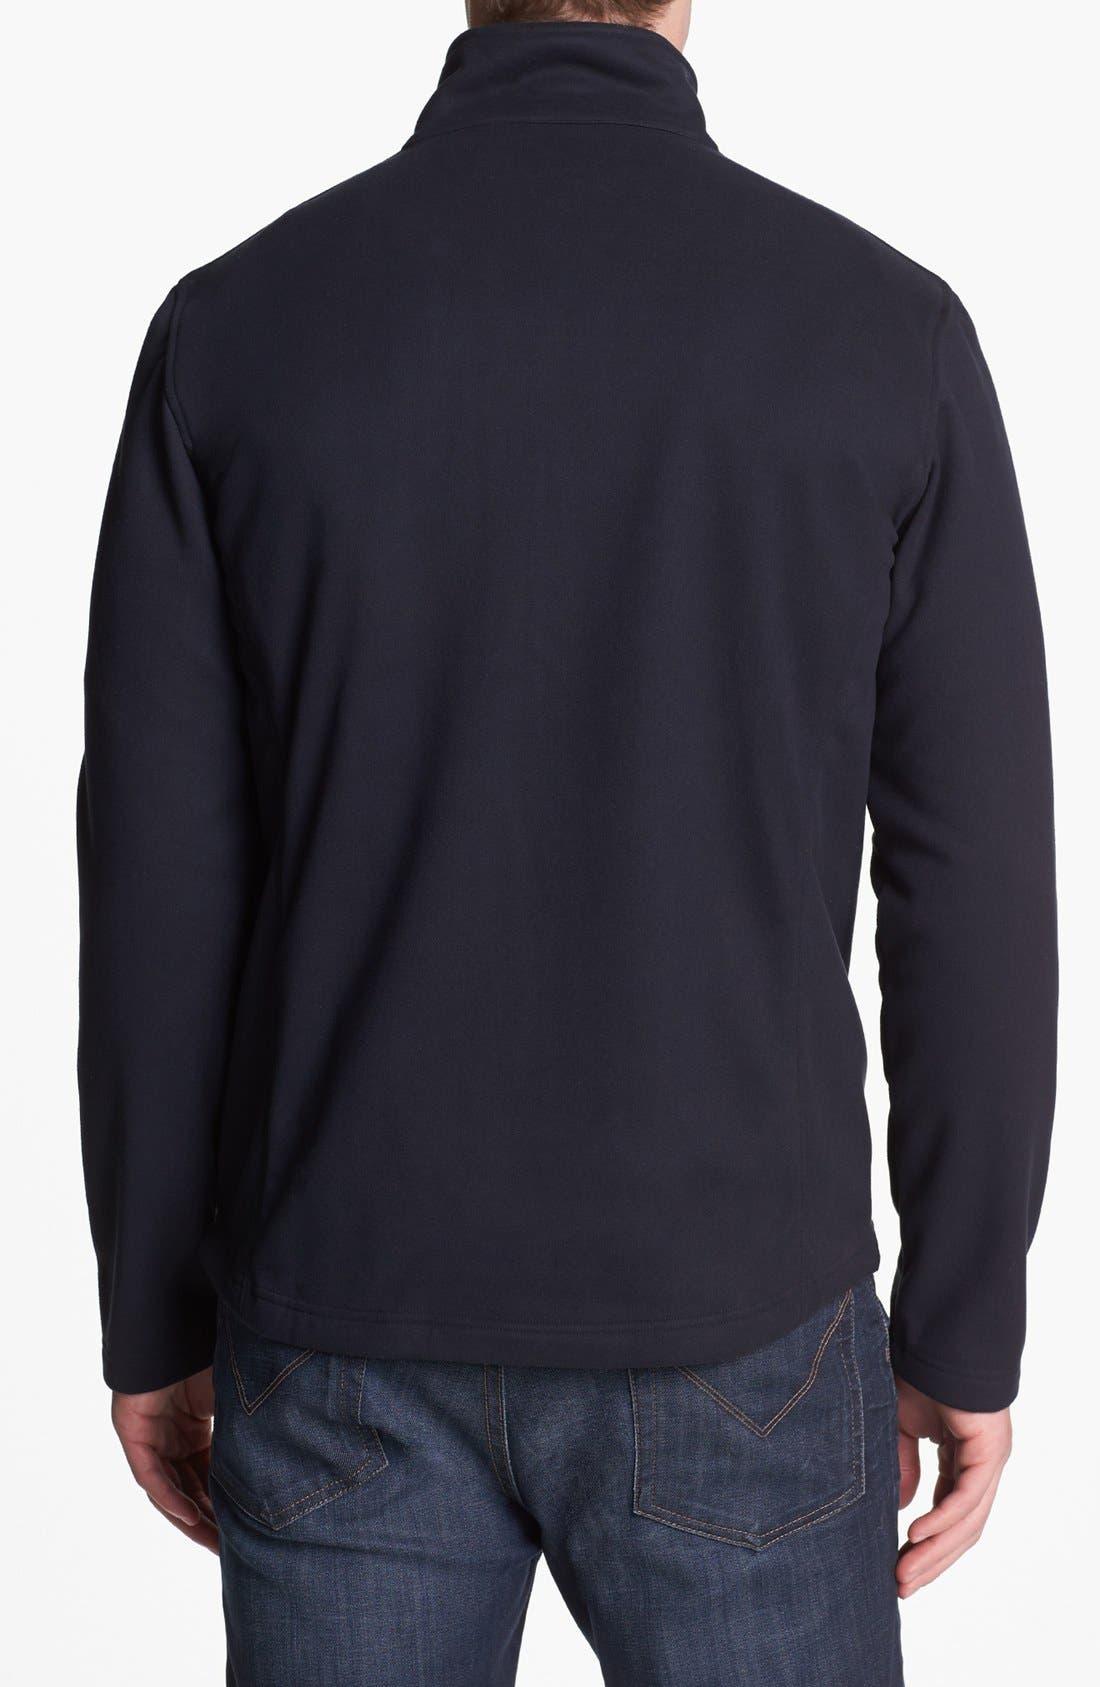 Alternate Image 2  - Victorinox Swiss Army® 'Matterhorn' Tailored Fit Fleece Jacket